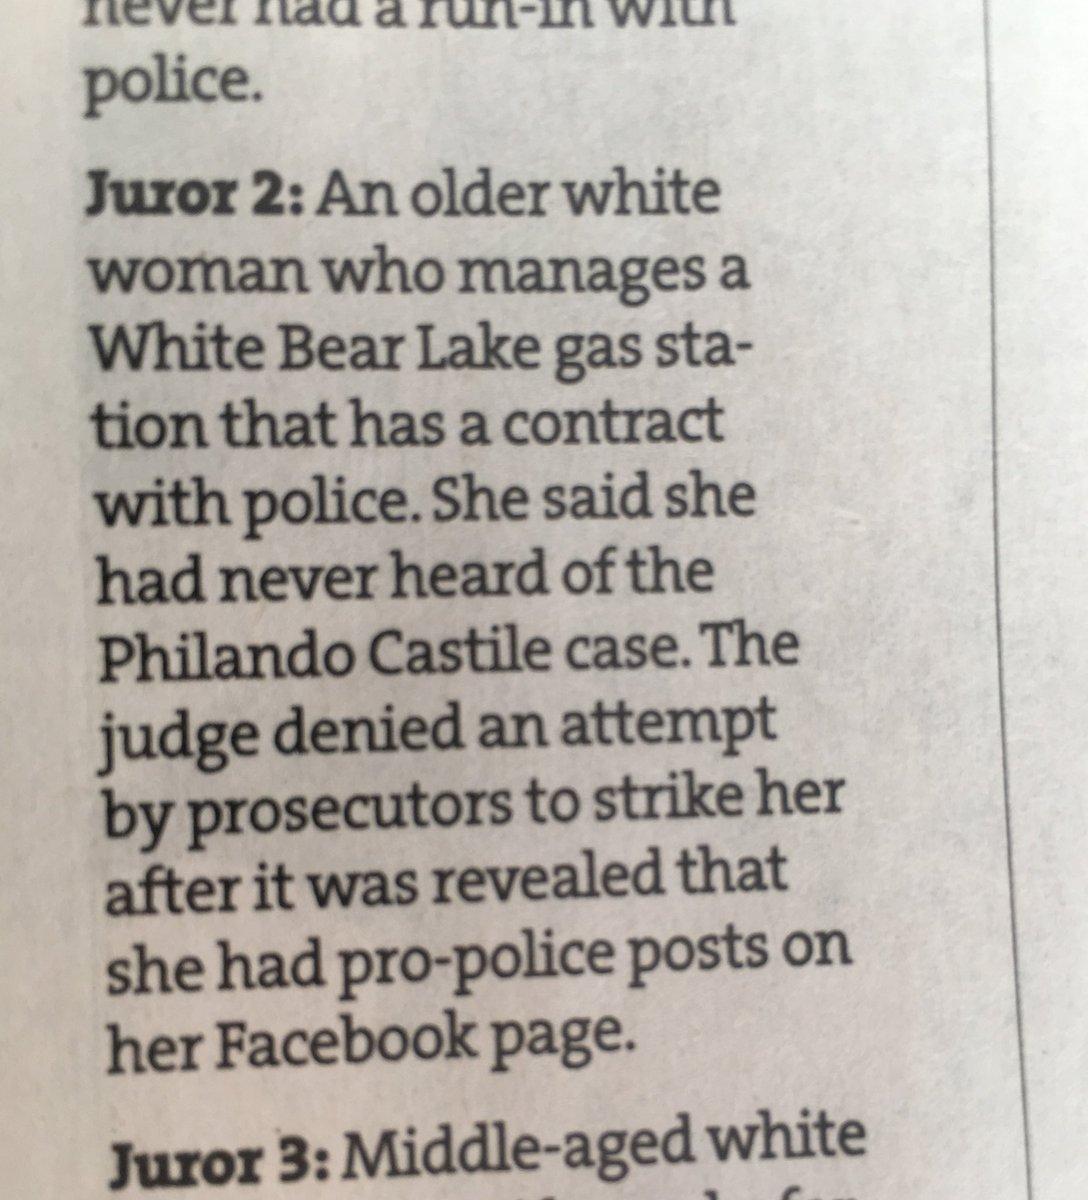 A few of the jurors. #PhilandoCastile https://t.co/gThKq80dQr